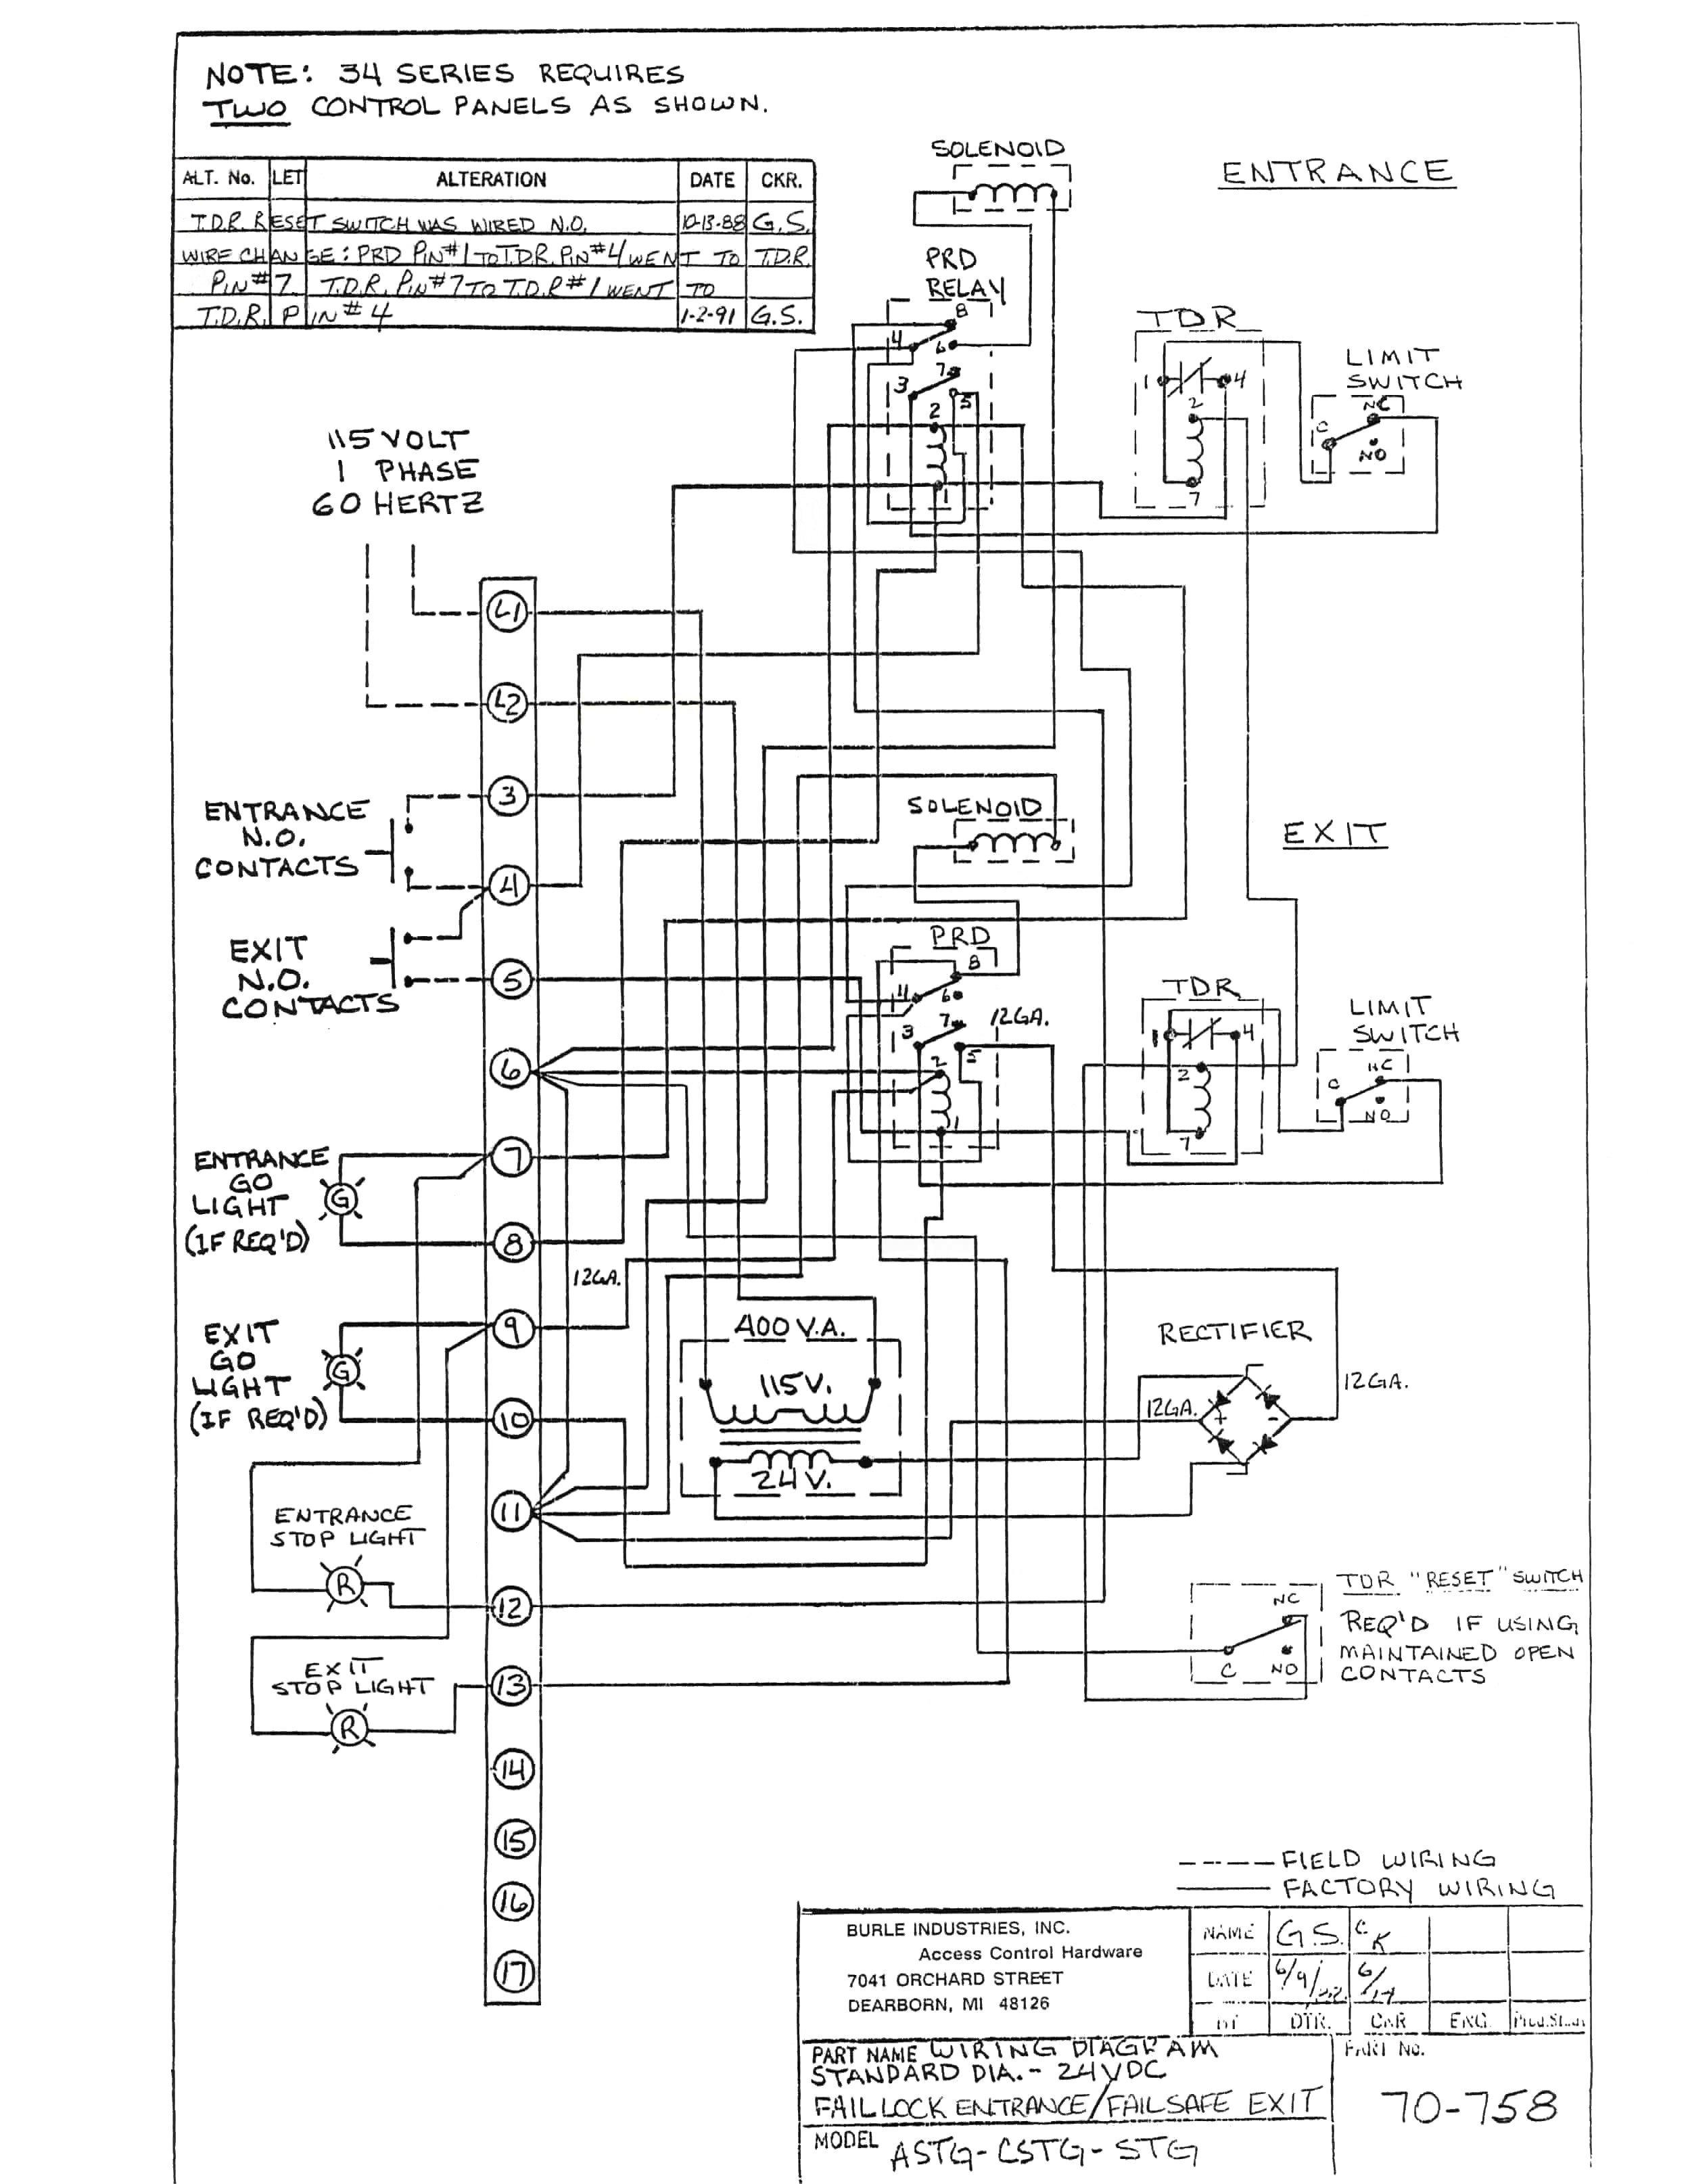 Heat Pump Schematic Wiring Sequence besides Ecobee3 Wiring Diagram Heat Pump furthermore Heil Package Heat Pump Schematic besides Trane Wiring Diagrams Model Twe in addition Intercity Furnace Parts Diagram. on trane heat pump models